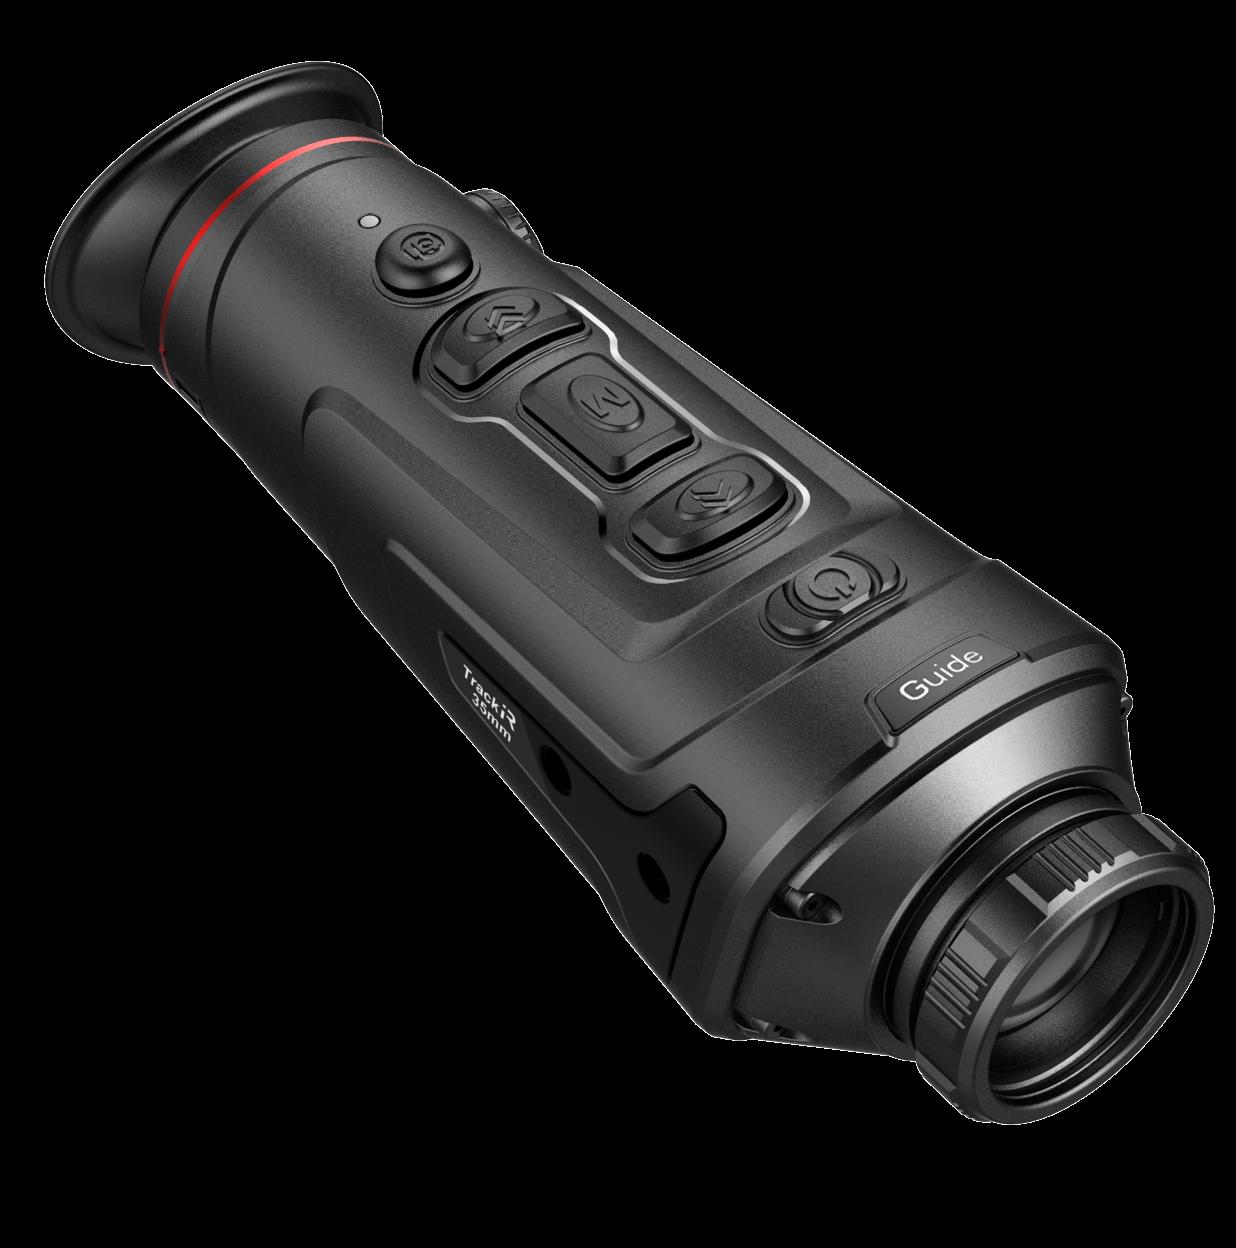 Monokular termowizyjny GUIDE TrackIR 35mm